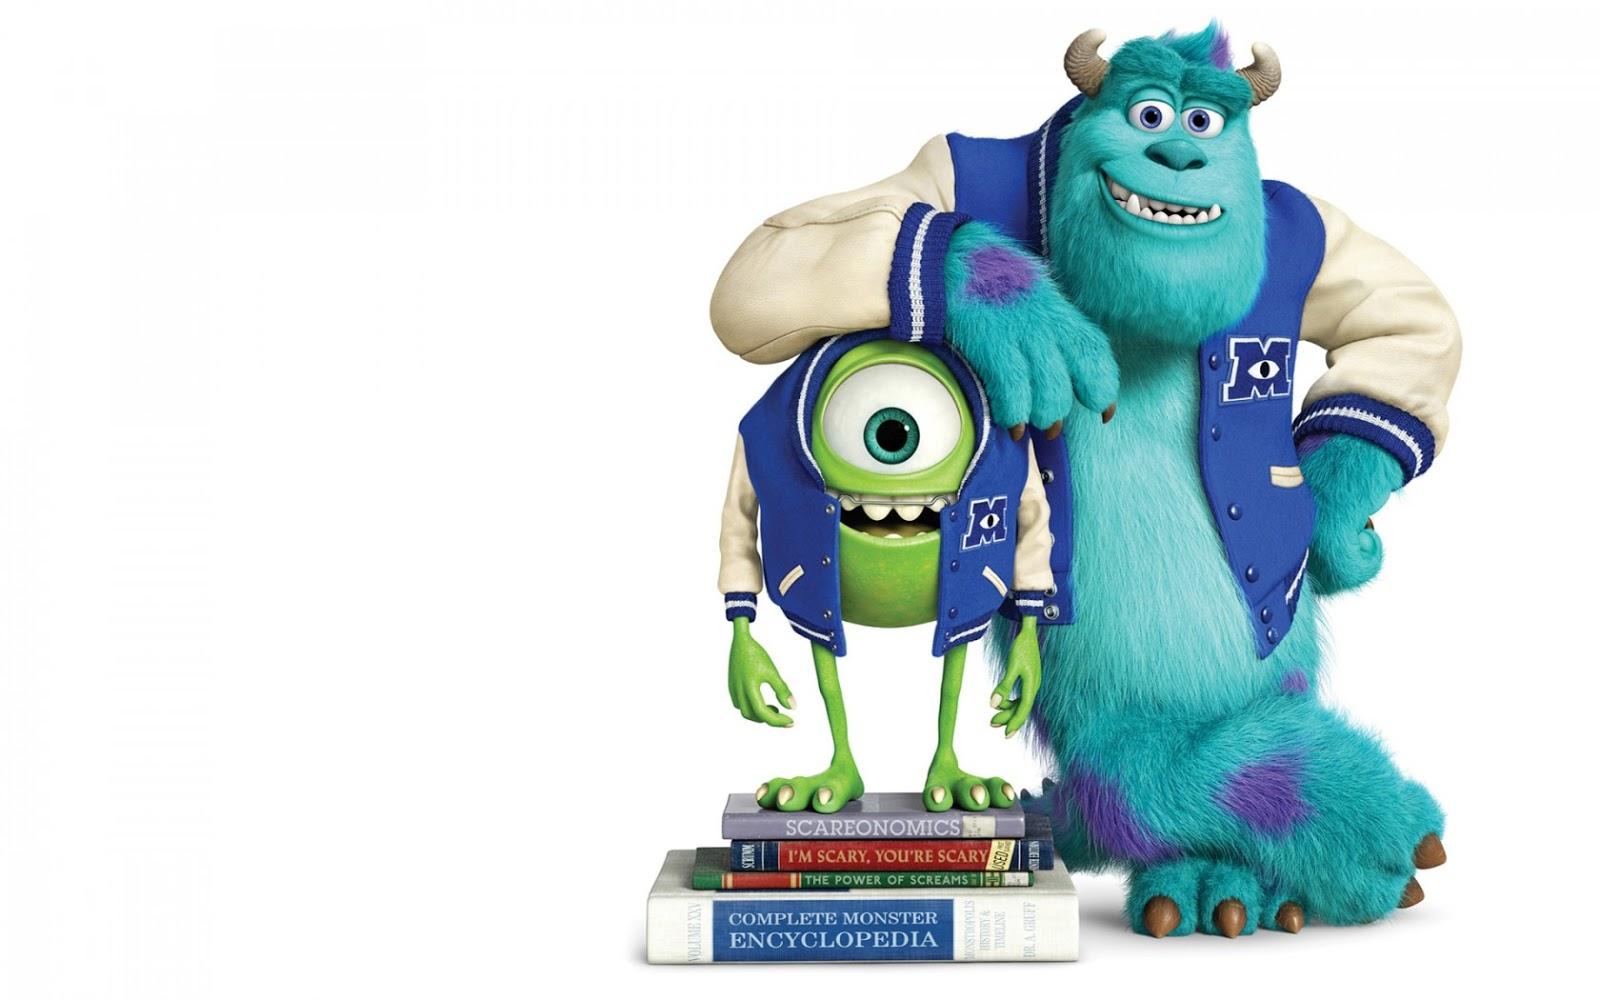 News: pixar's inside out confirmed (aka the numskulls)